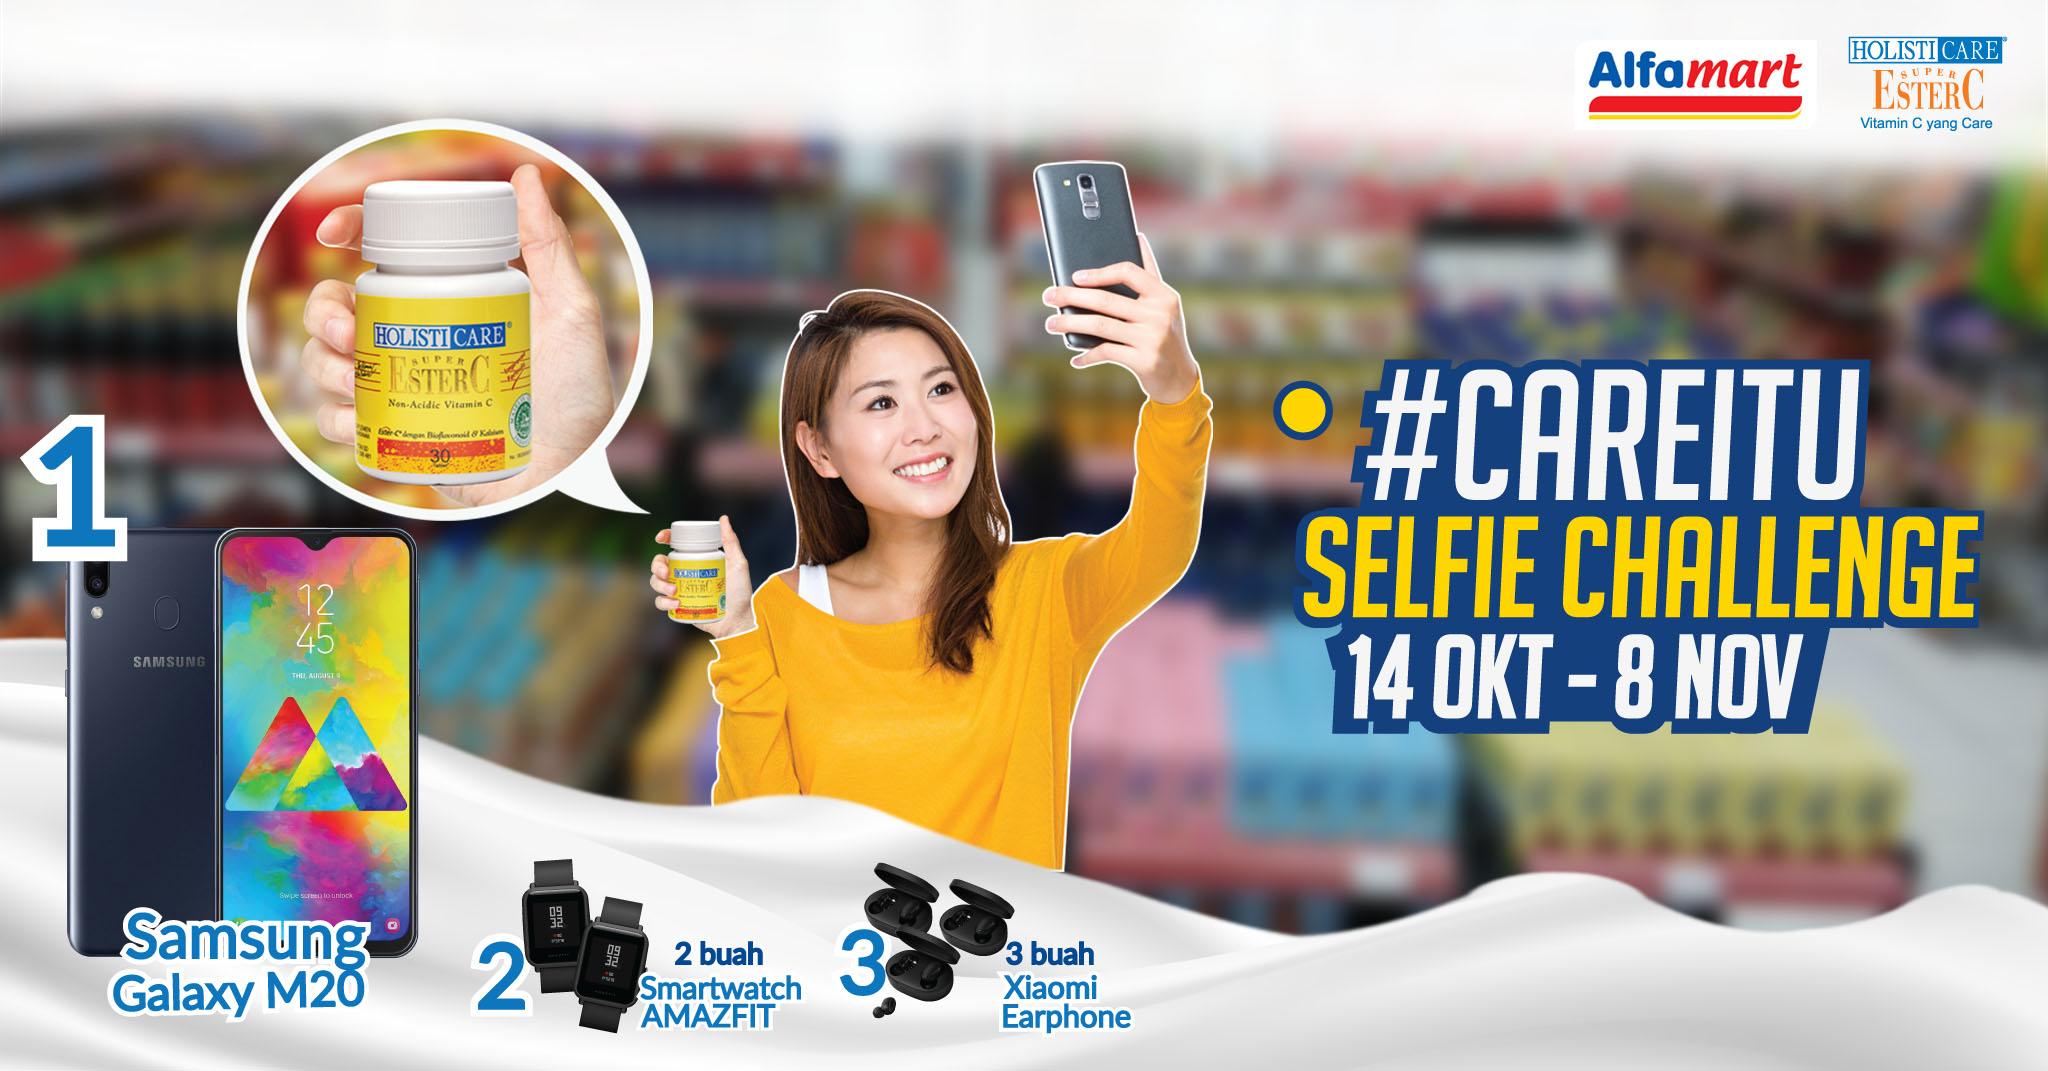 careitu selfie challenge